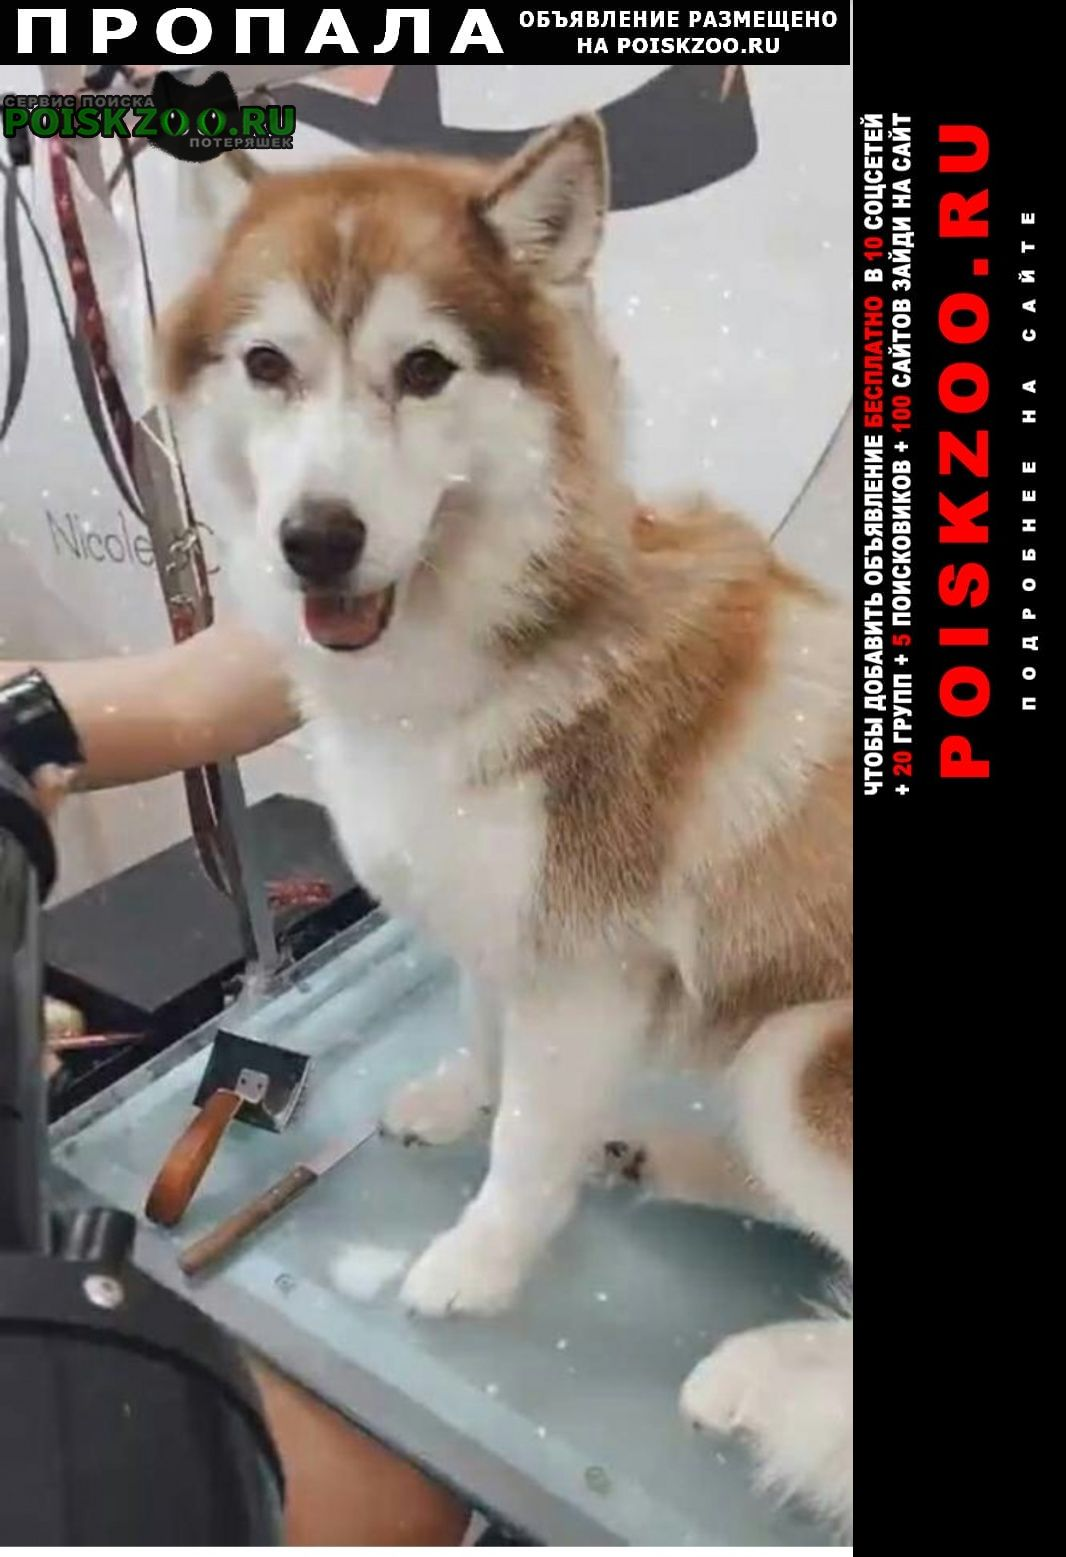 Пропала собака порода хаски Санкт-Петербург